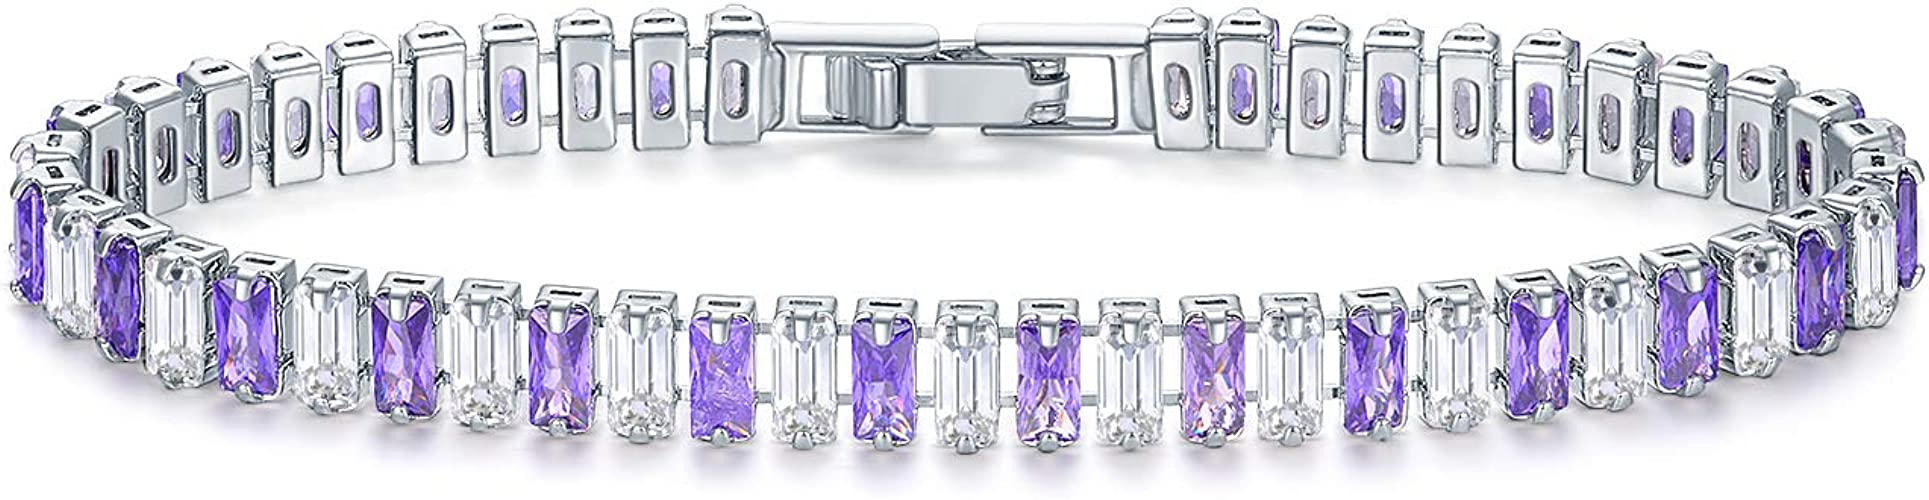 EEPIRR Colorful Rectangle Shape AAA+ CZ Diamond TennisBracelet forWomen 18K White Gold Plates Bracelets Wedding Party GiftsJewelry